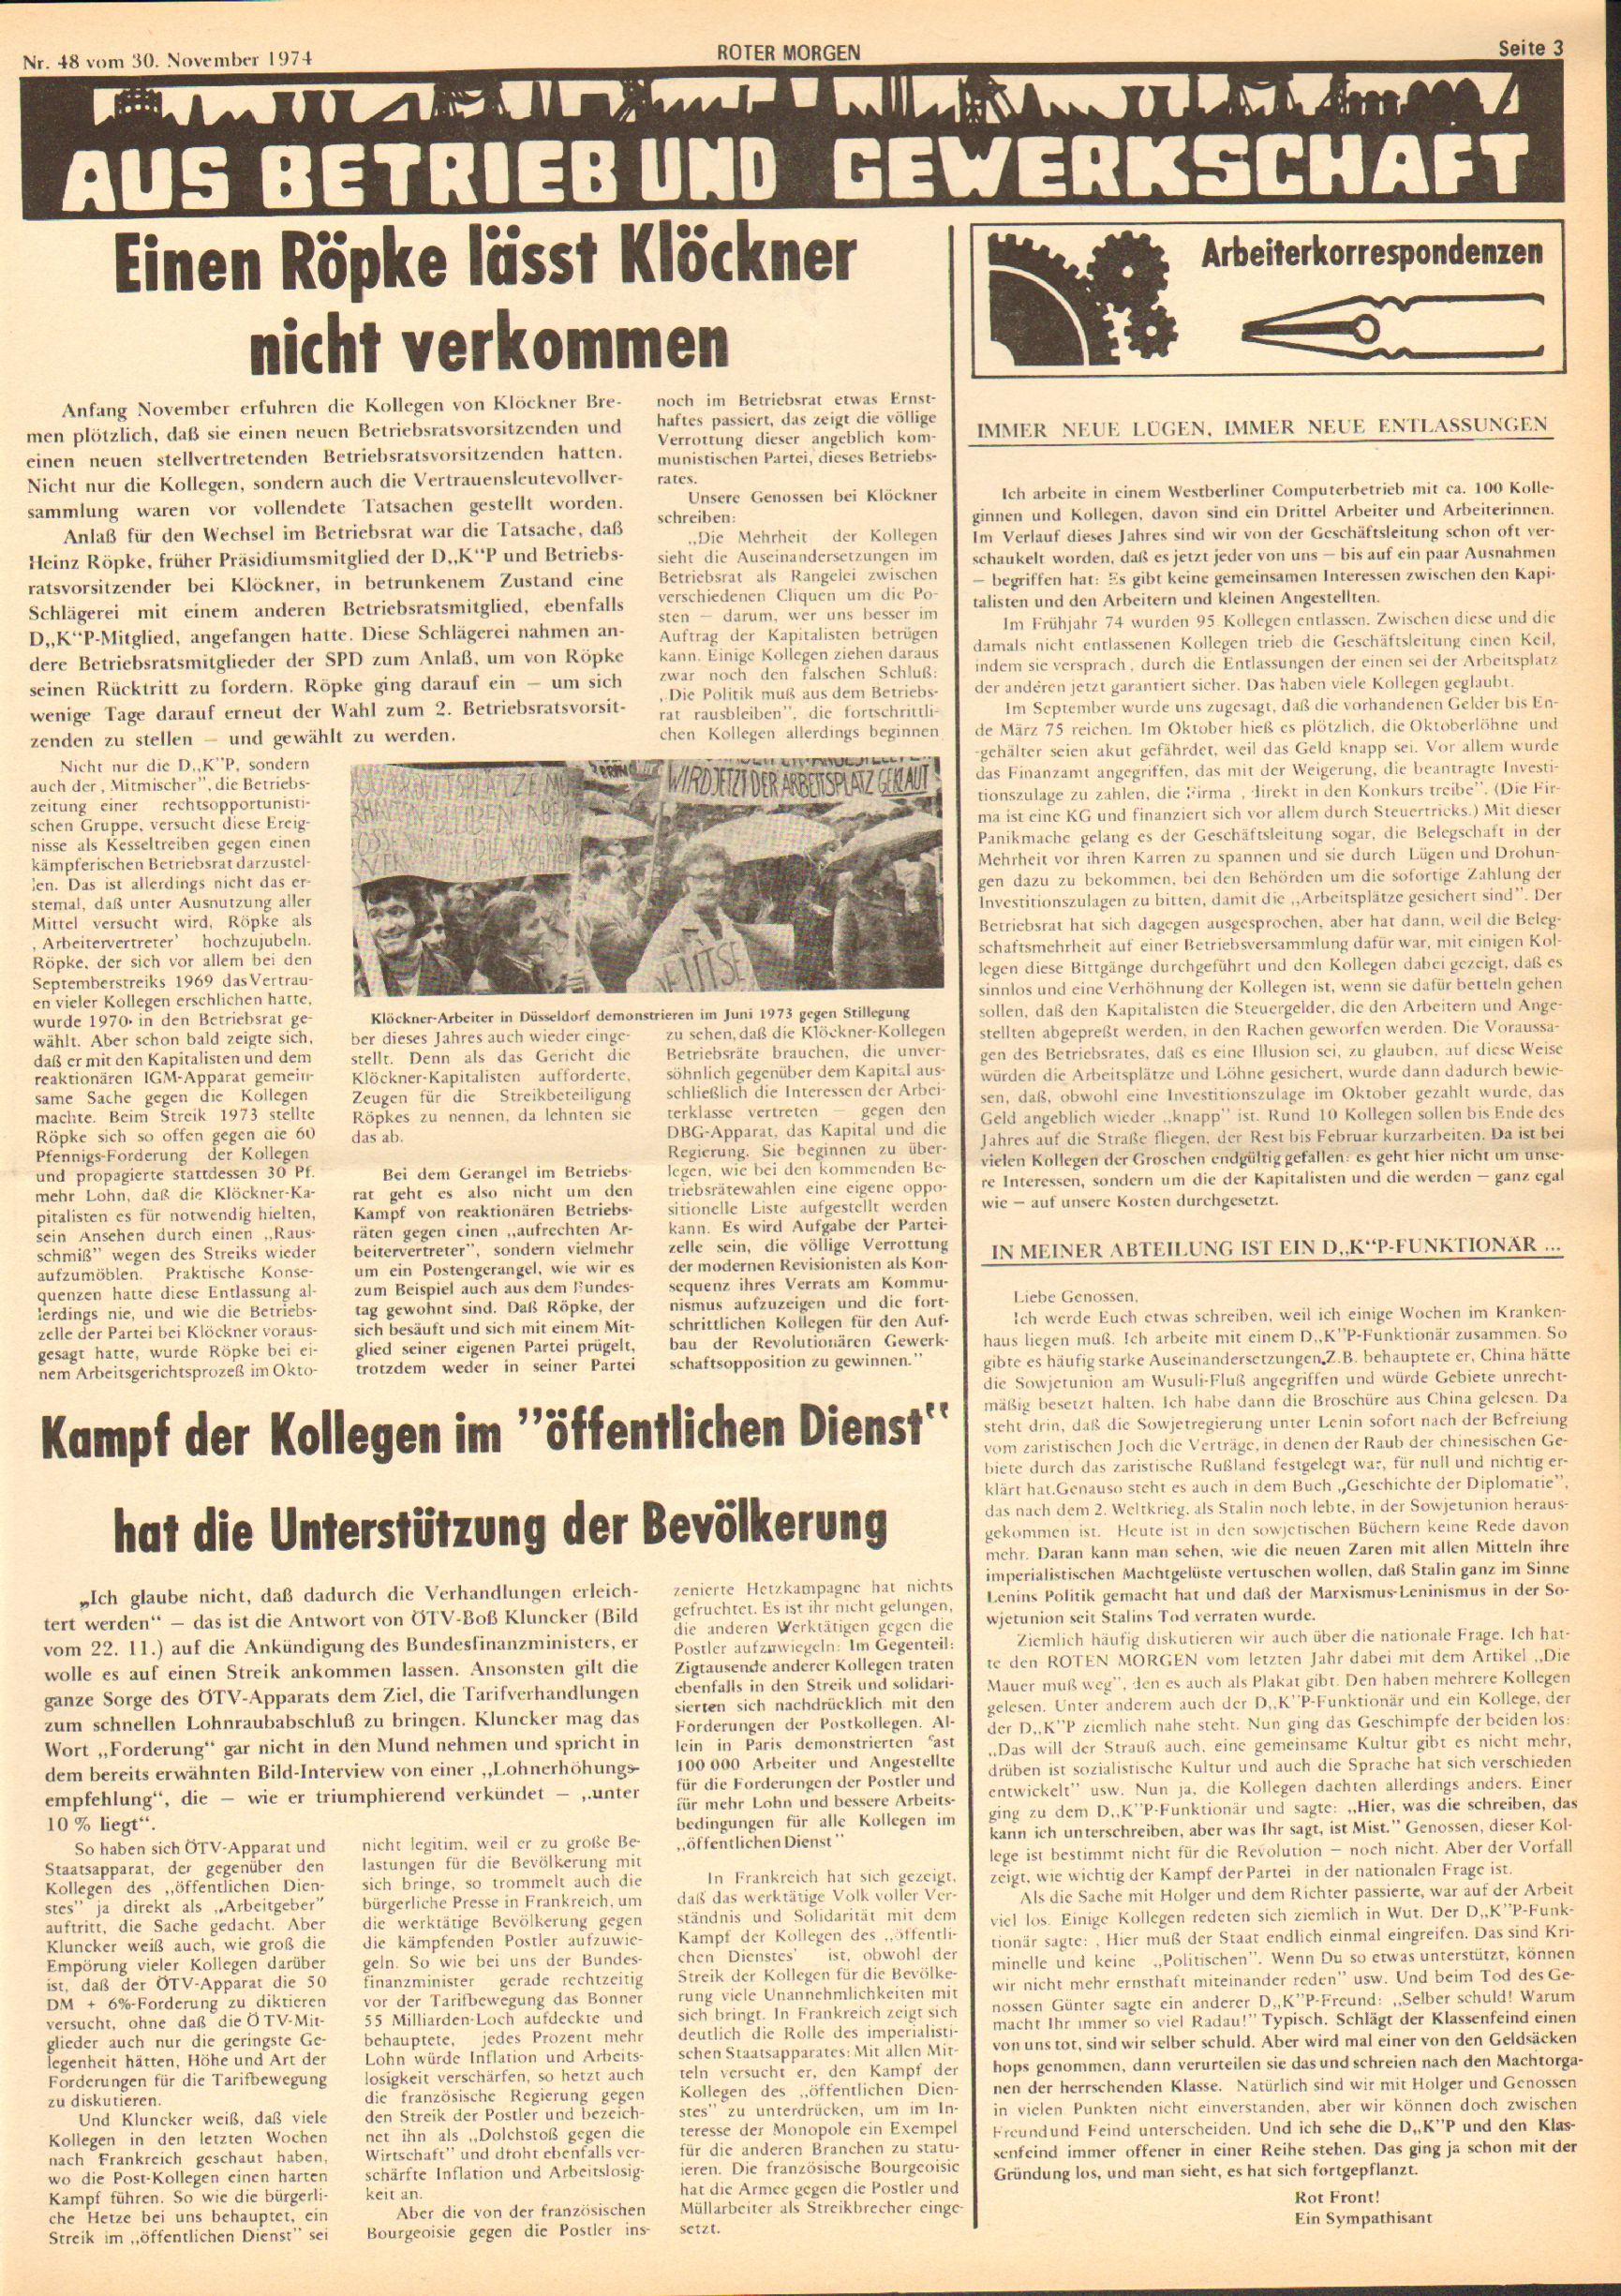 Roter Morgen, 8. Jg., 30. November 1974, Nr. 48, Seite 3